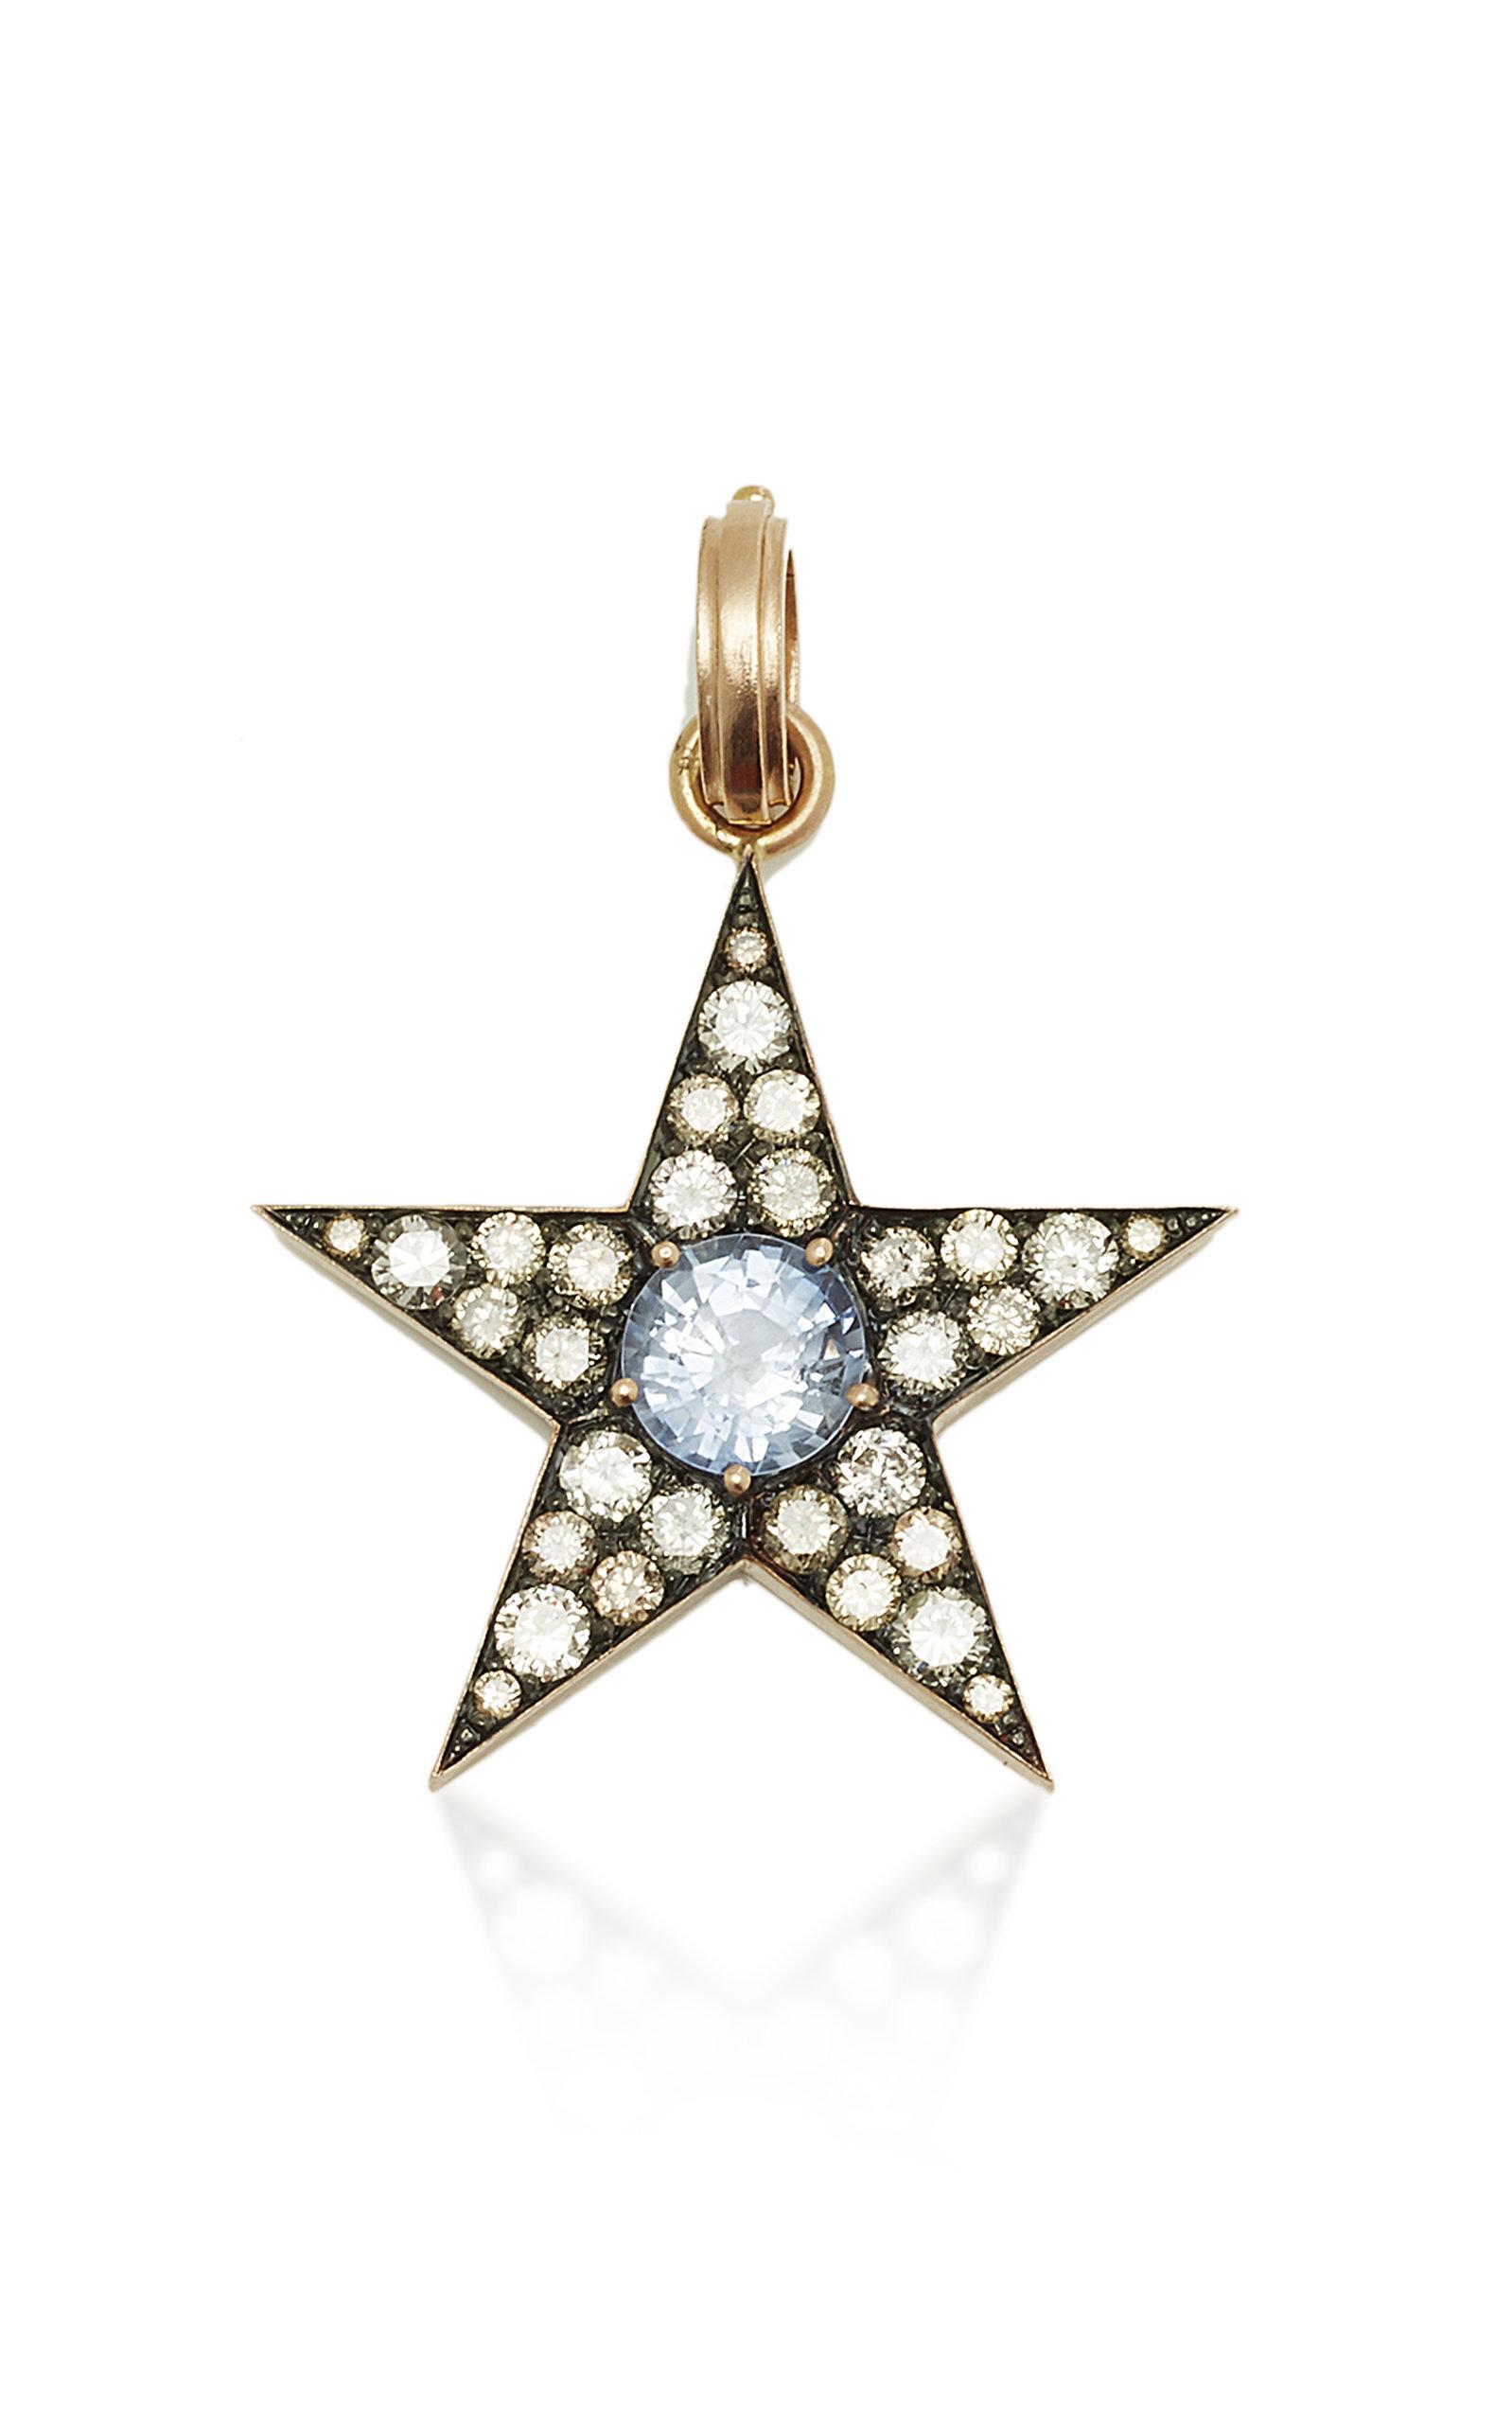 SYLVA & CIE CEYLON SAPPHIRE & DIAMOND STAR PENDANT